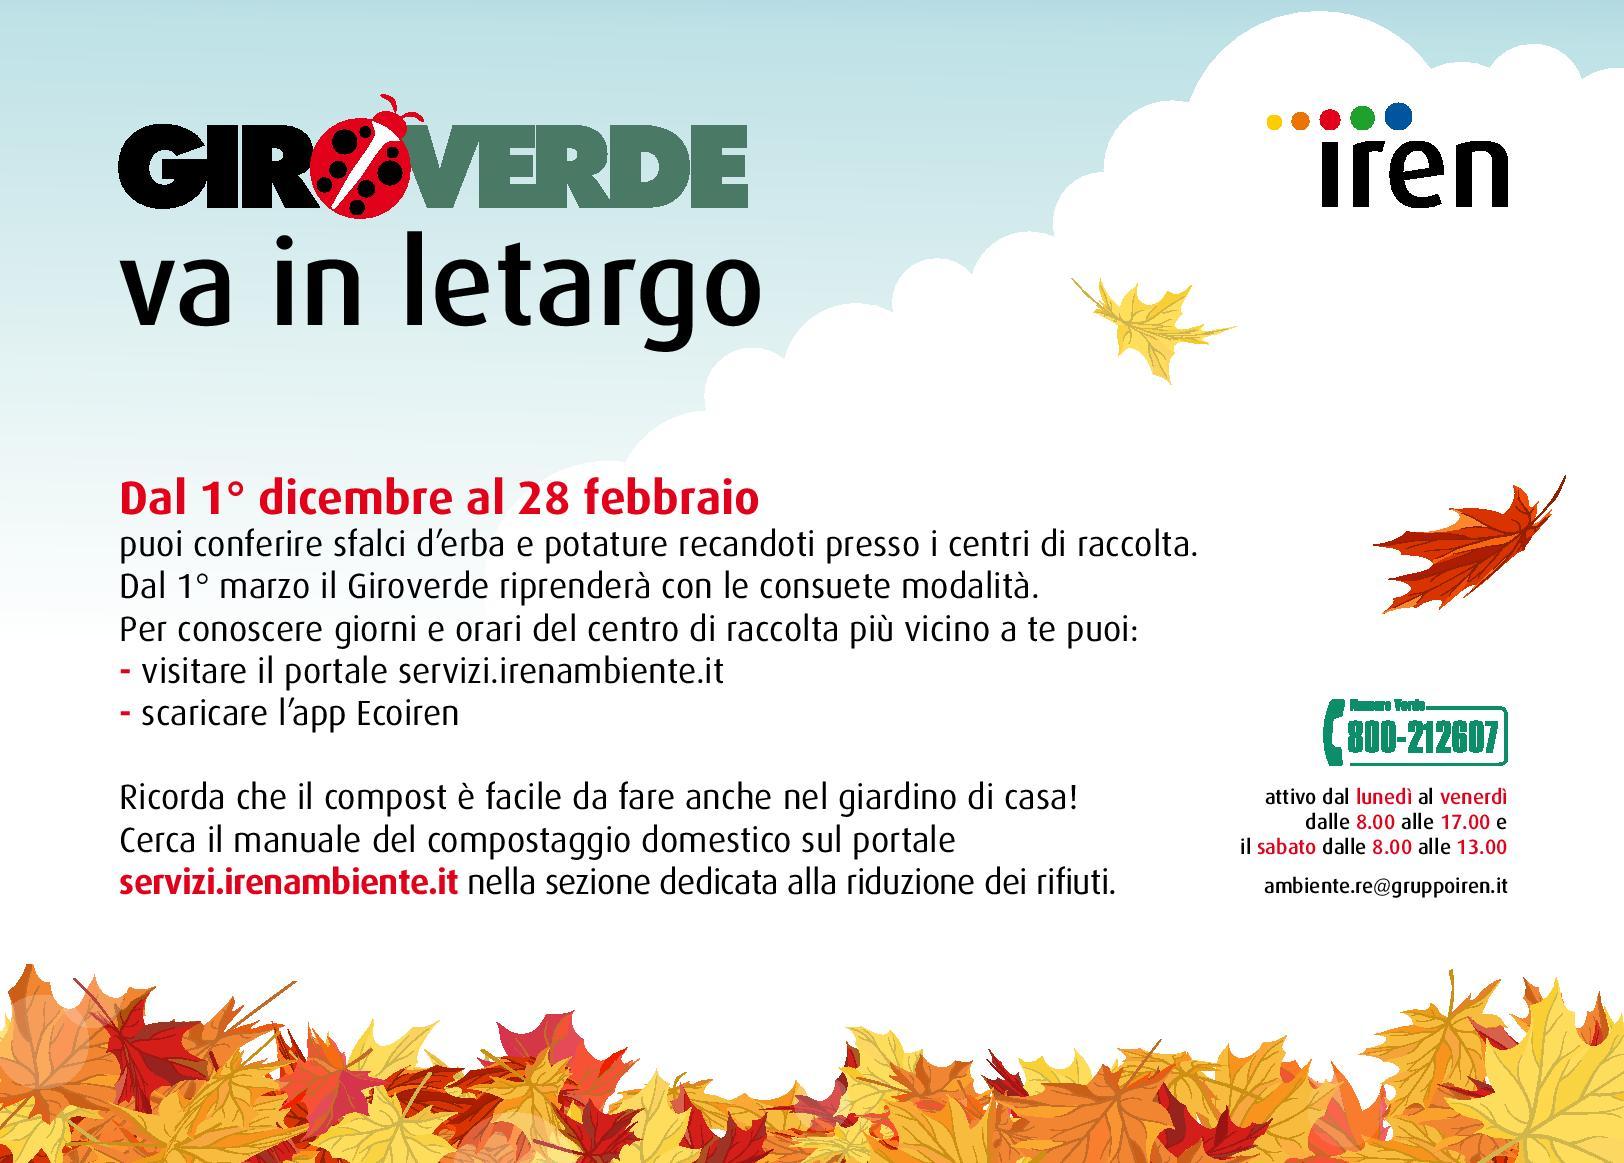 giroverde-va-in-letargo-volantino-page-001